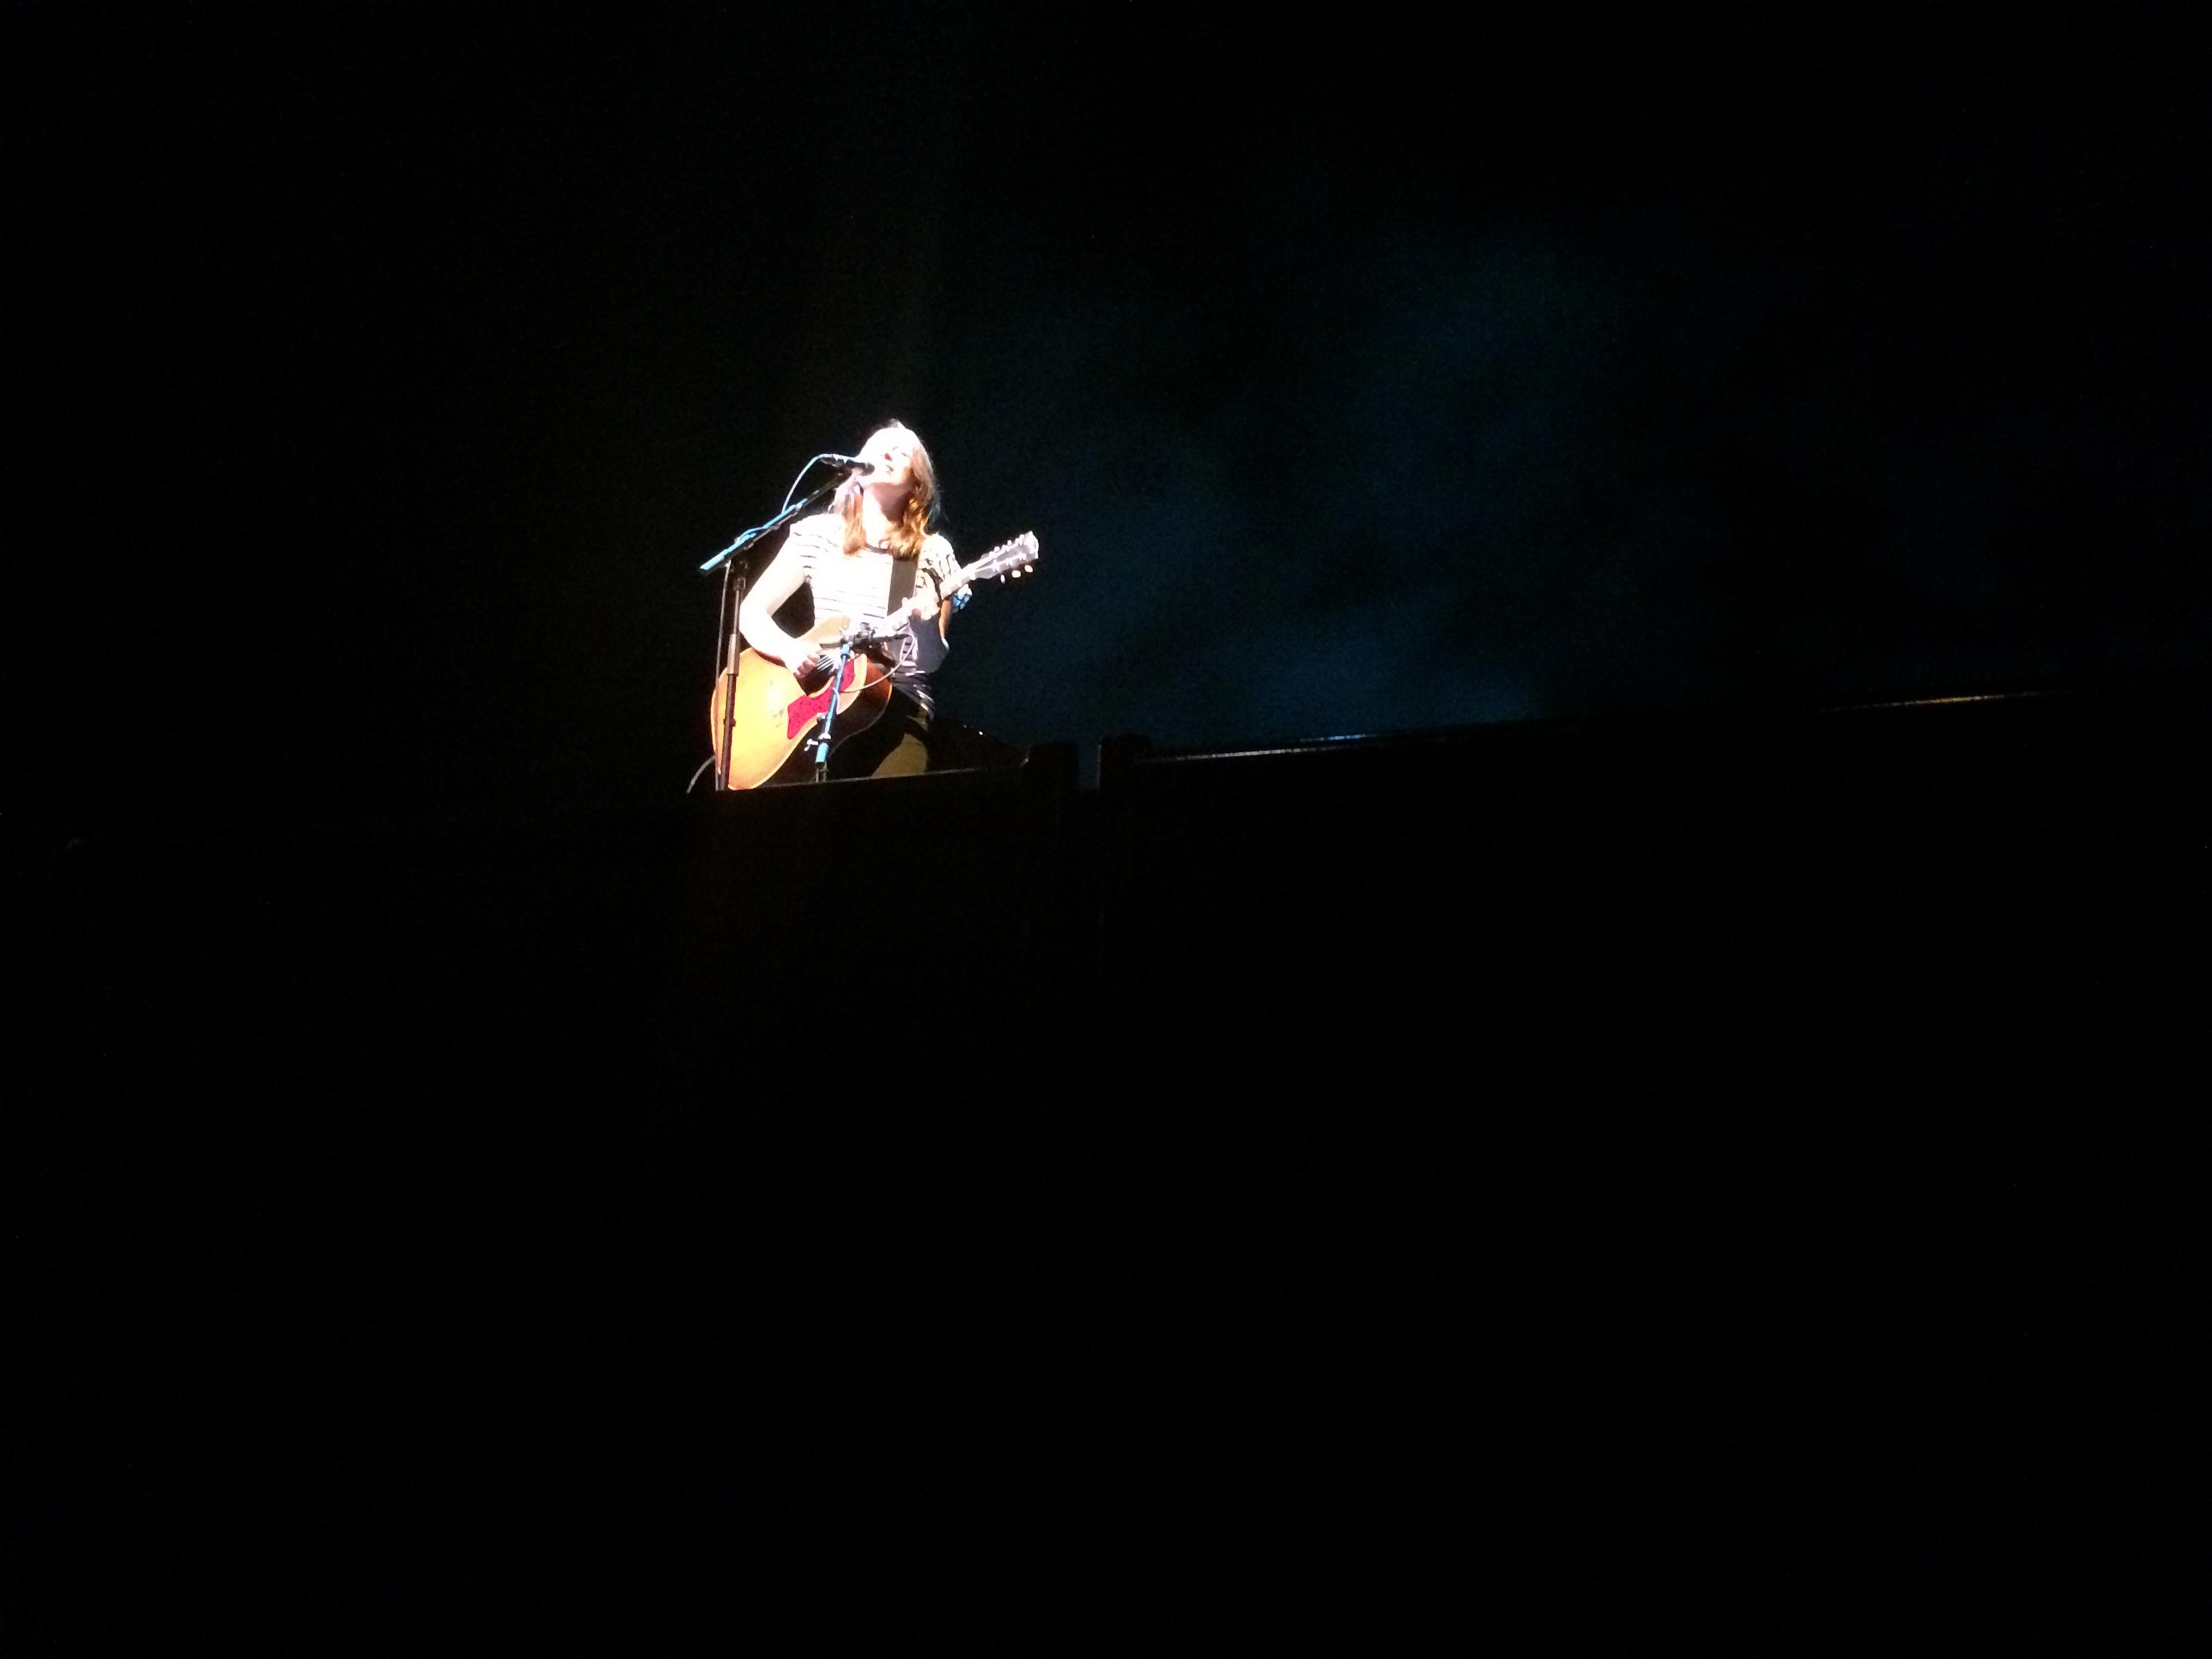 Concertreview: Stephanie Struijk the artist formerly know as Stevie Ann!